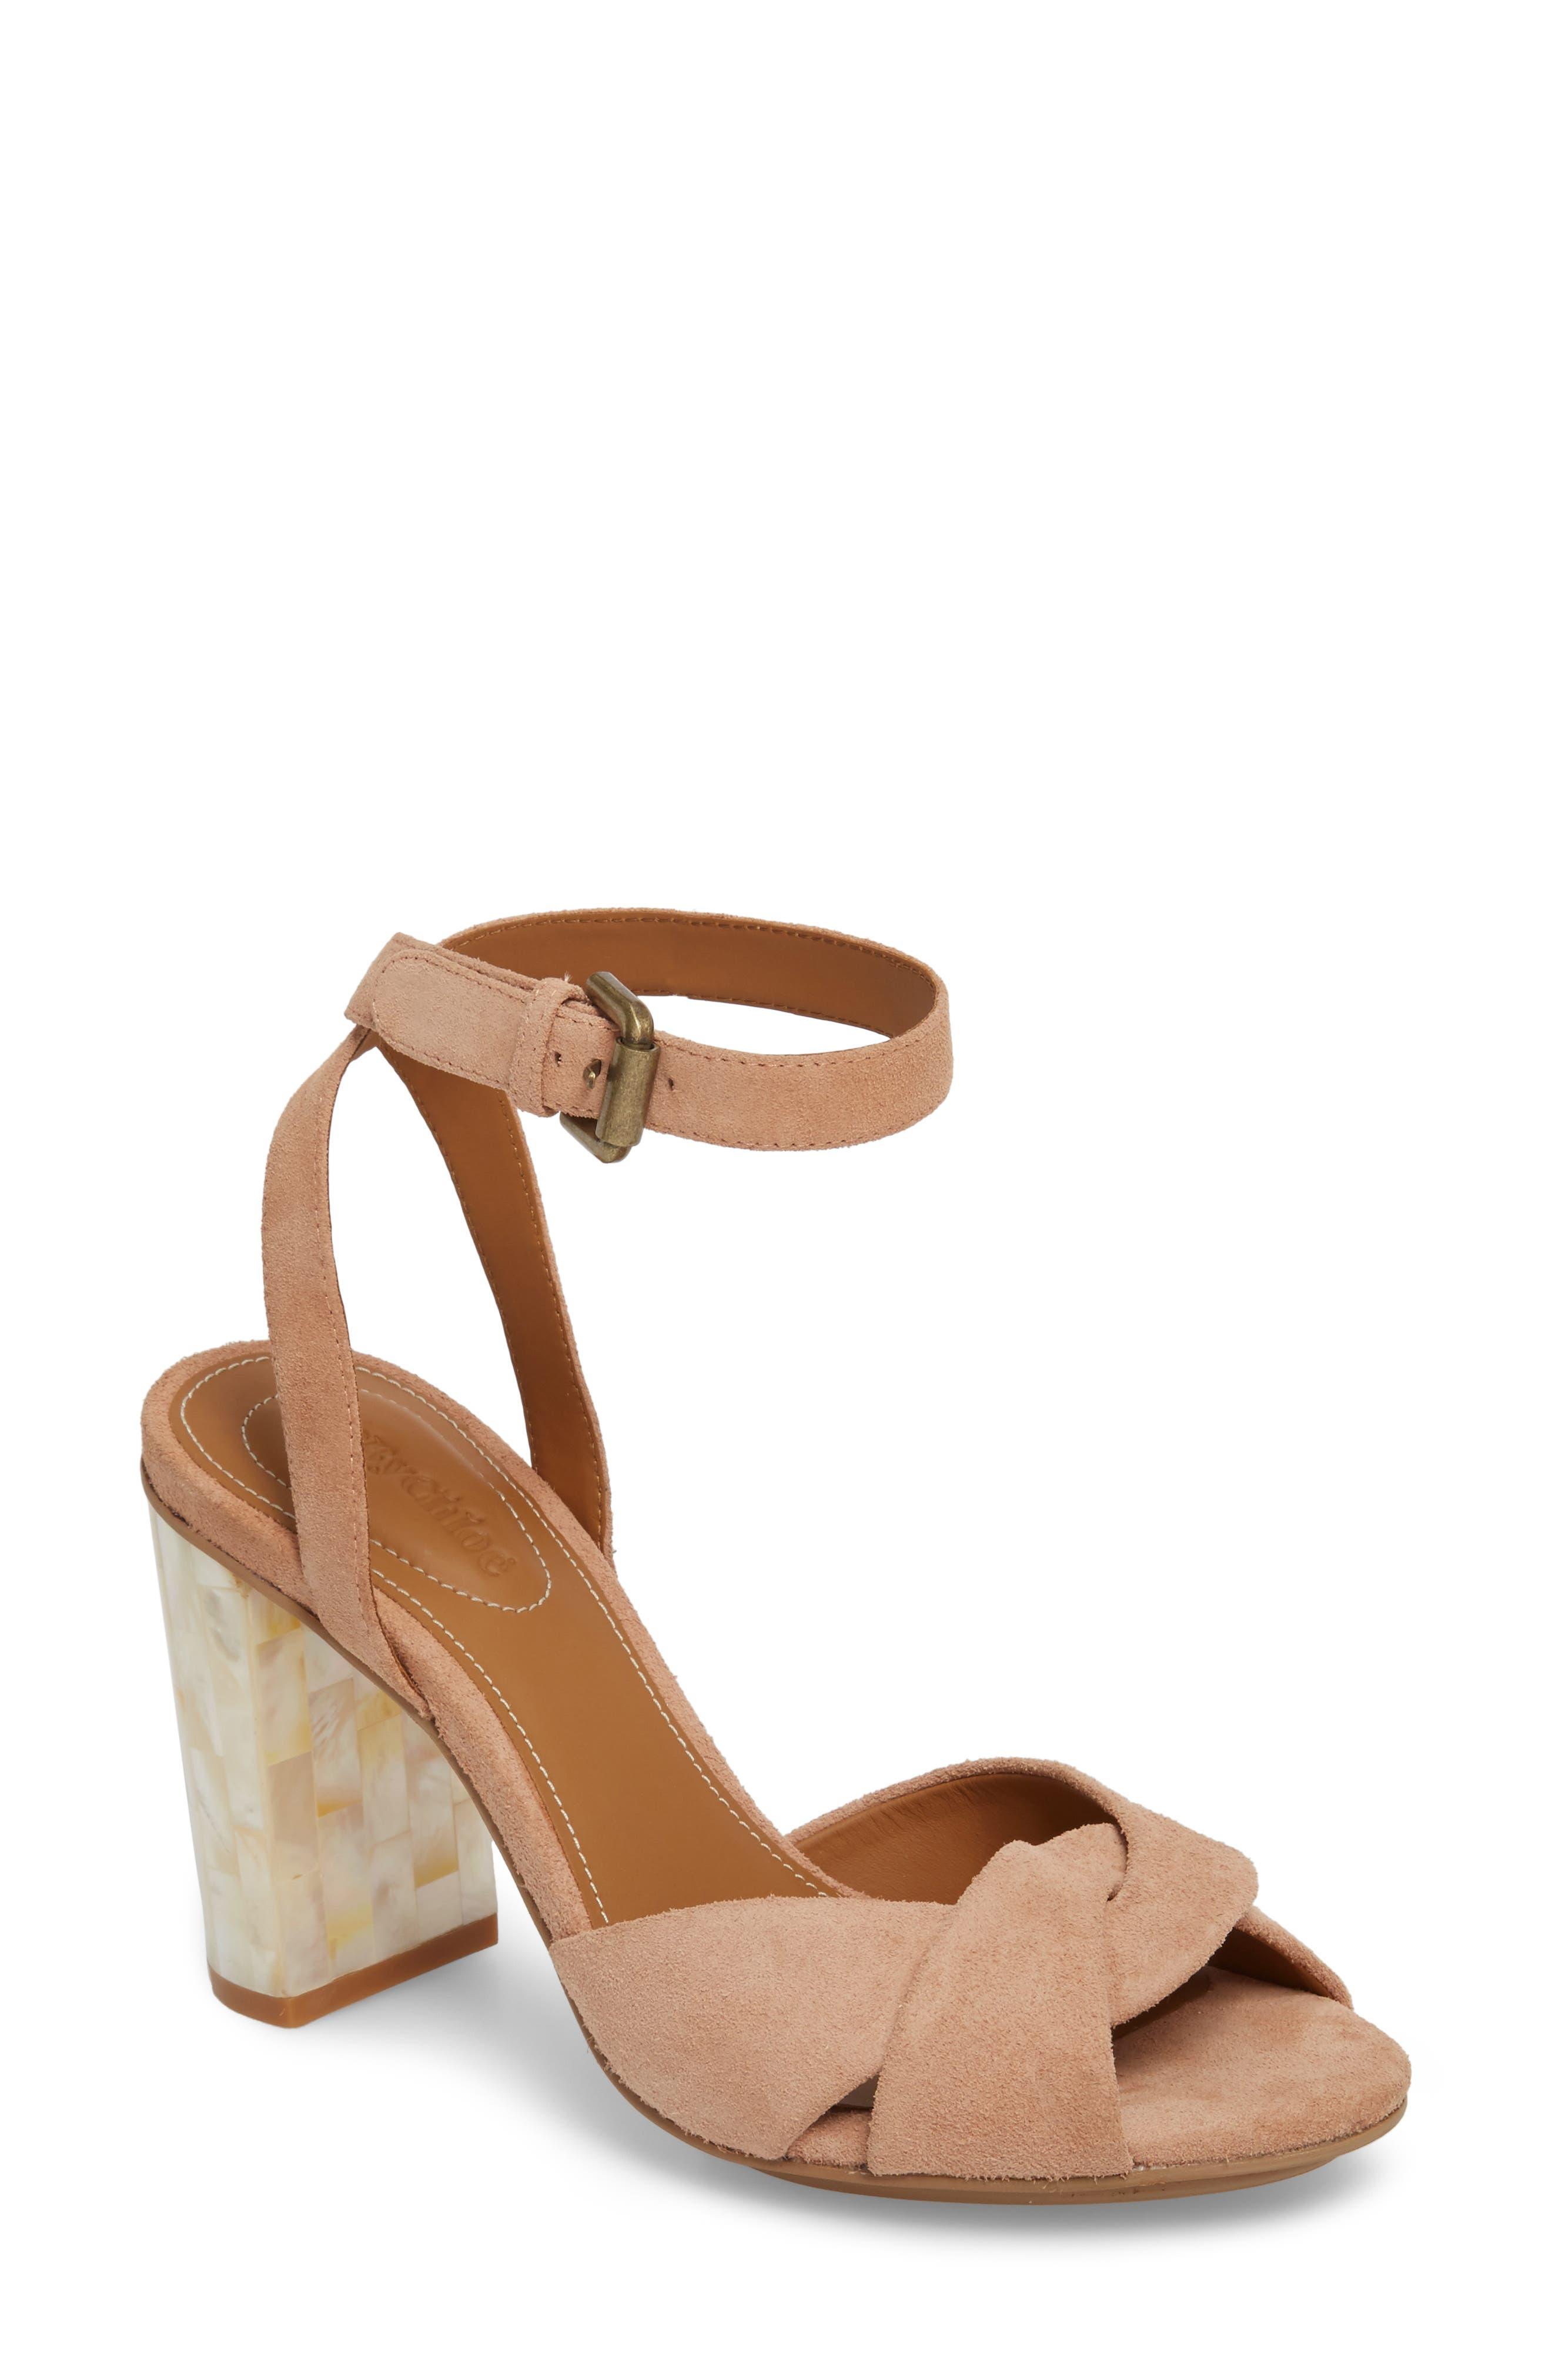 Isida Block Heel Sandal,                             Main thumbnail 1, color,                             210